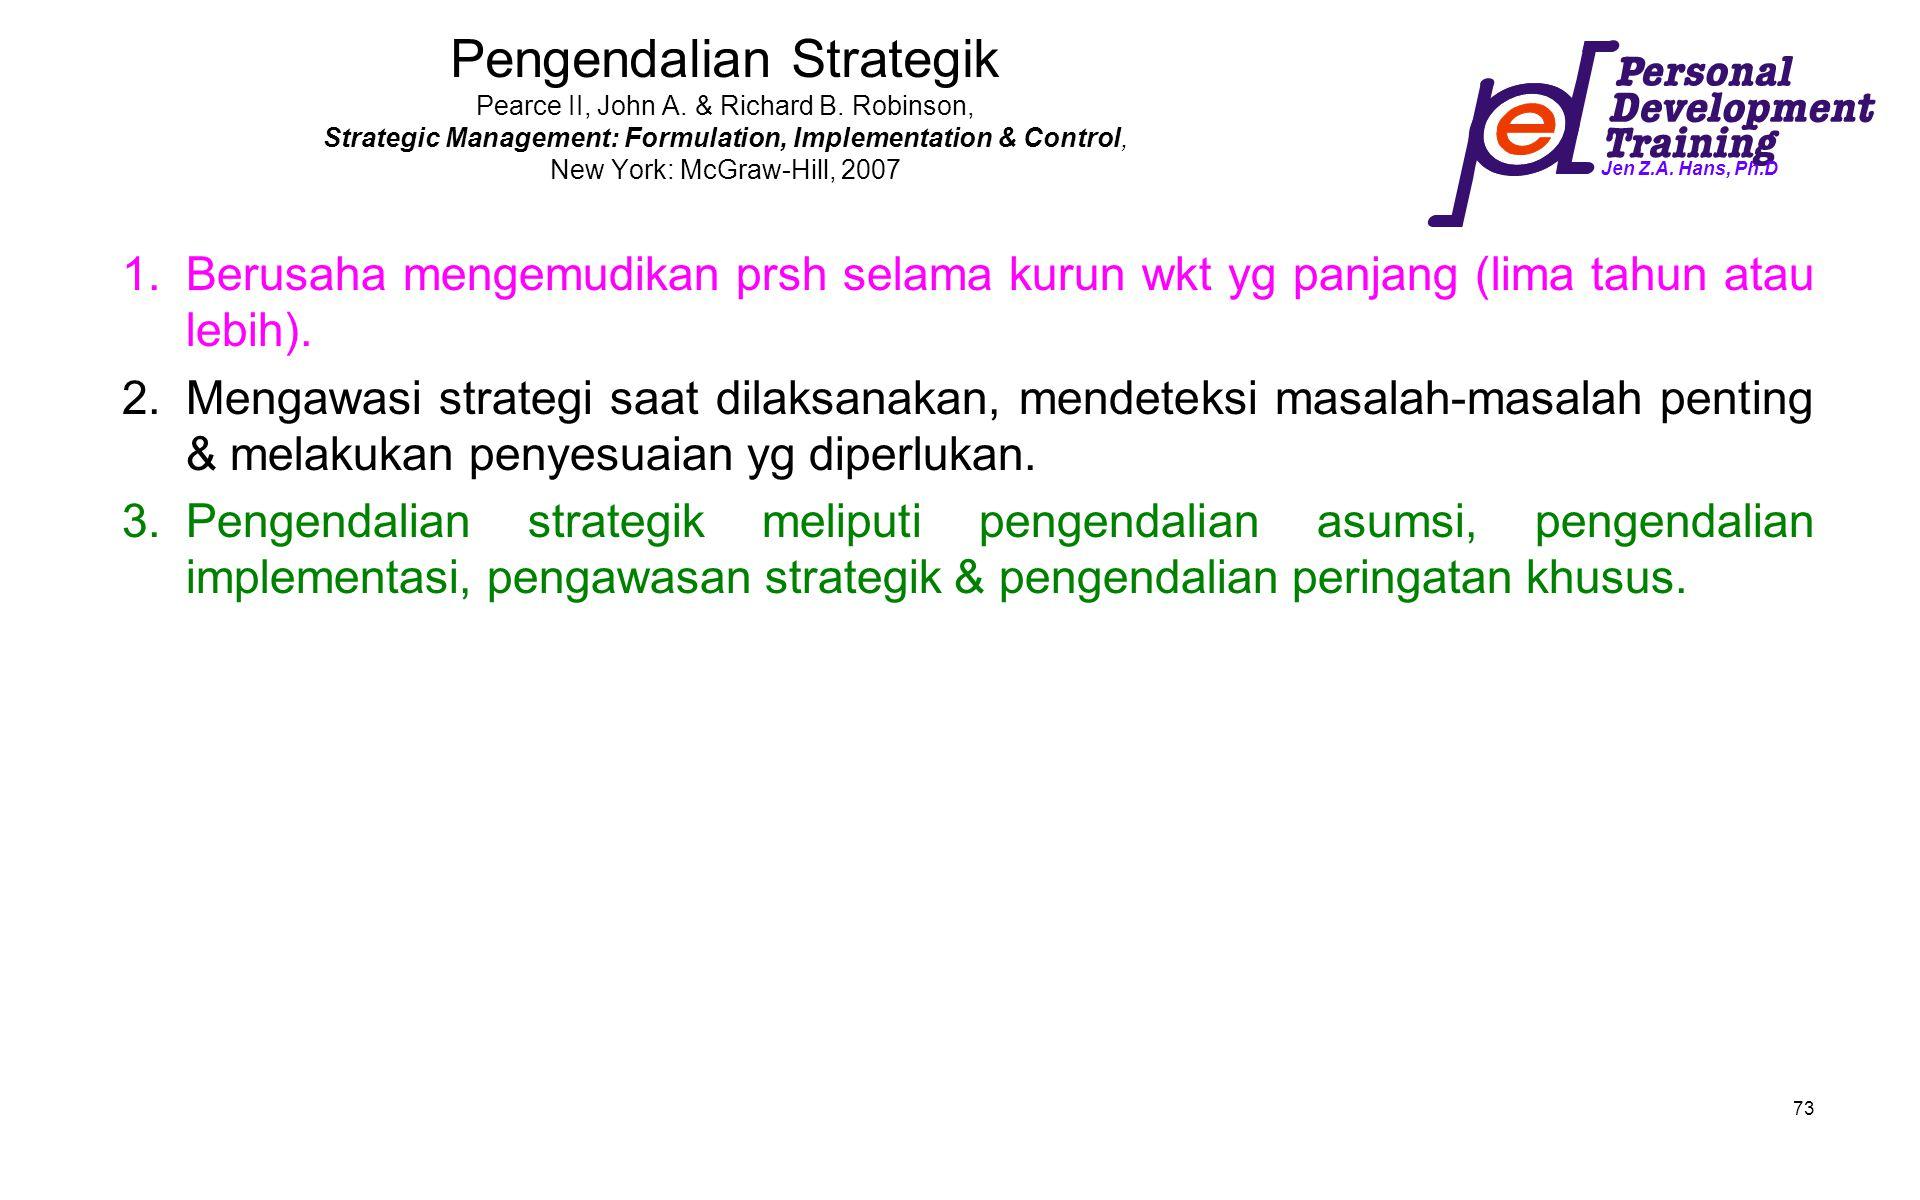 Jen Z.A. Hans, Ph.D 73 Pengendalian Strategik Pearce II, John A. & Richard B. Robinson, Strategic Management: Formulation, Implementation & Control, N